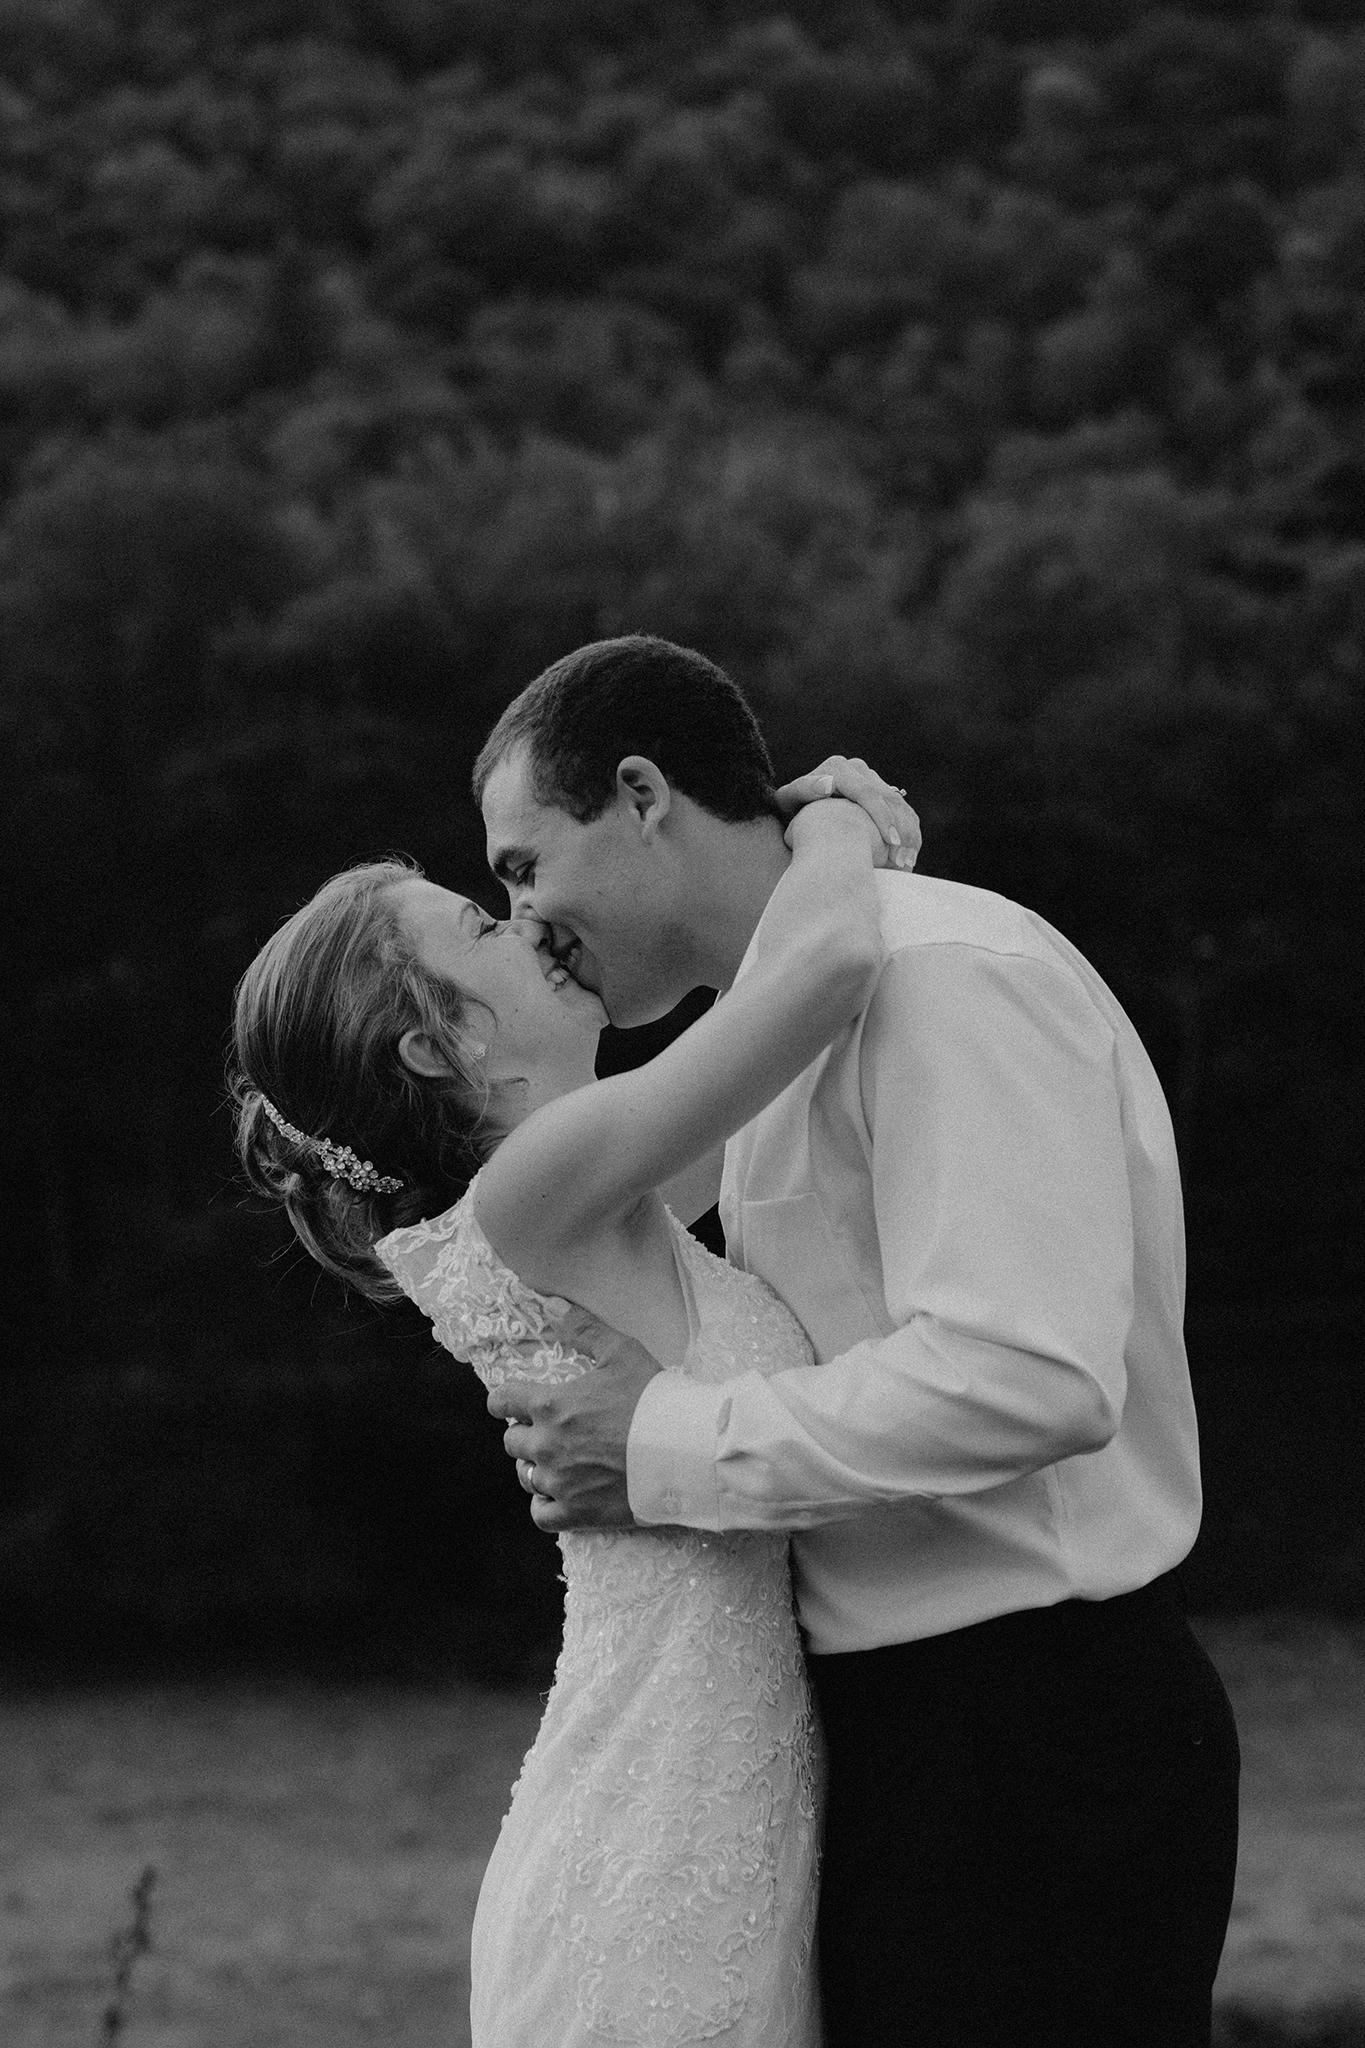 vermont-wedding-photographer-outdoor-farm-wedding-74.jpg